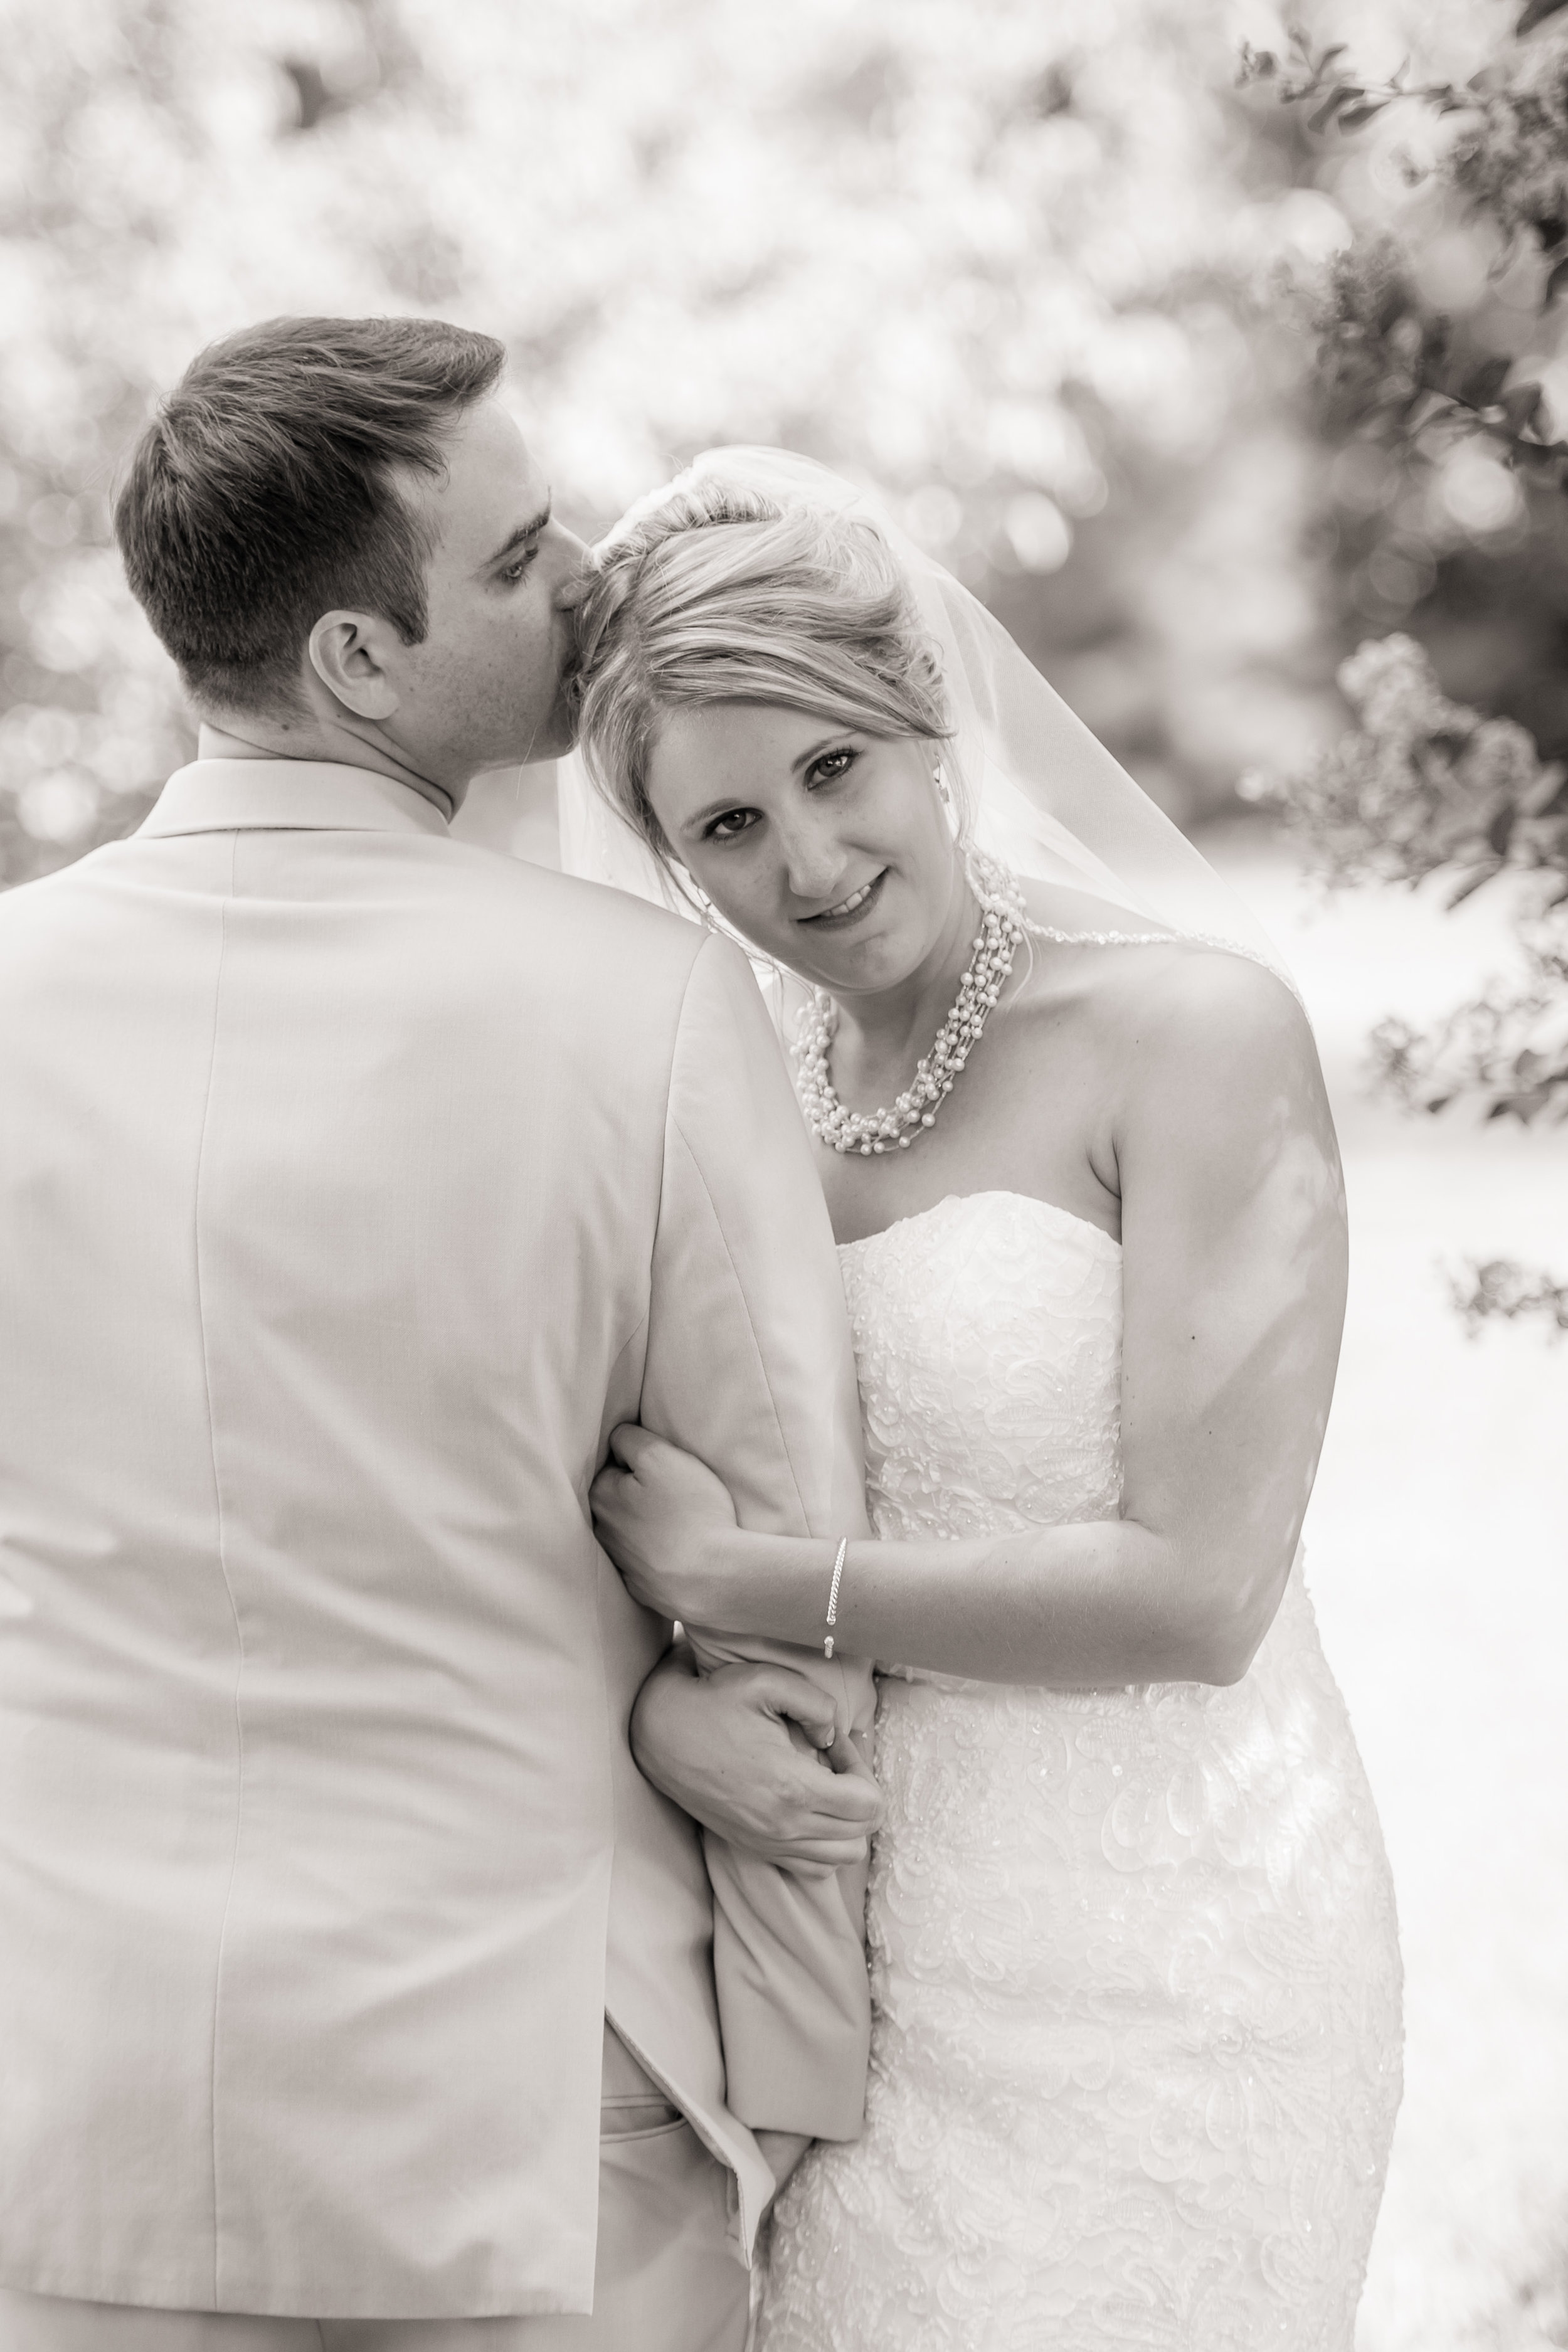 Justin + Amanda_Married420 copy.jpg